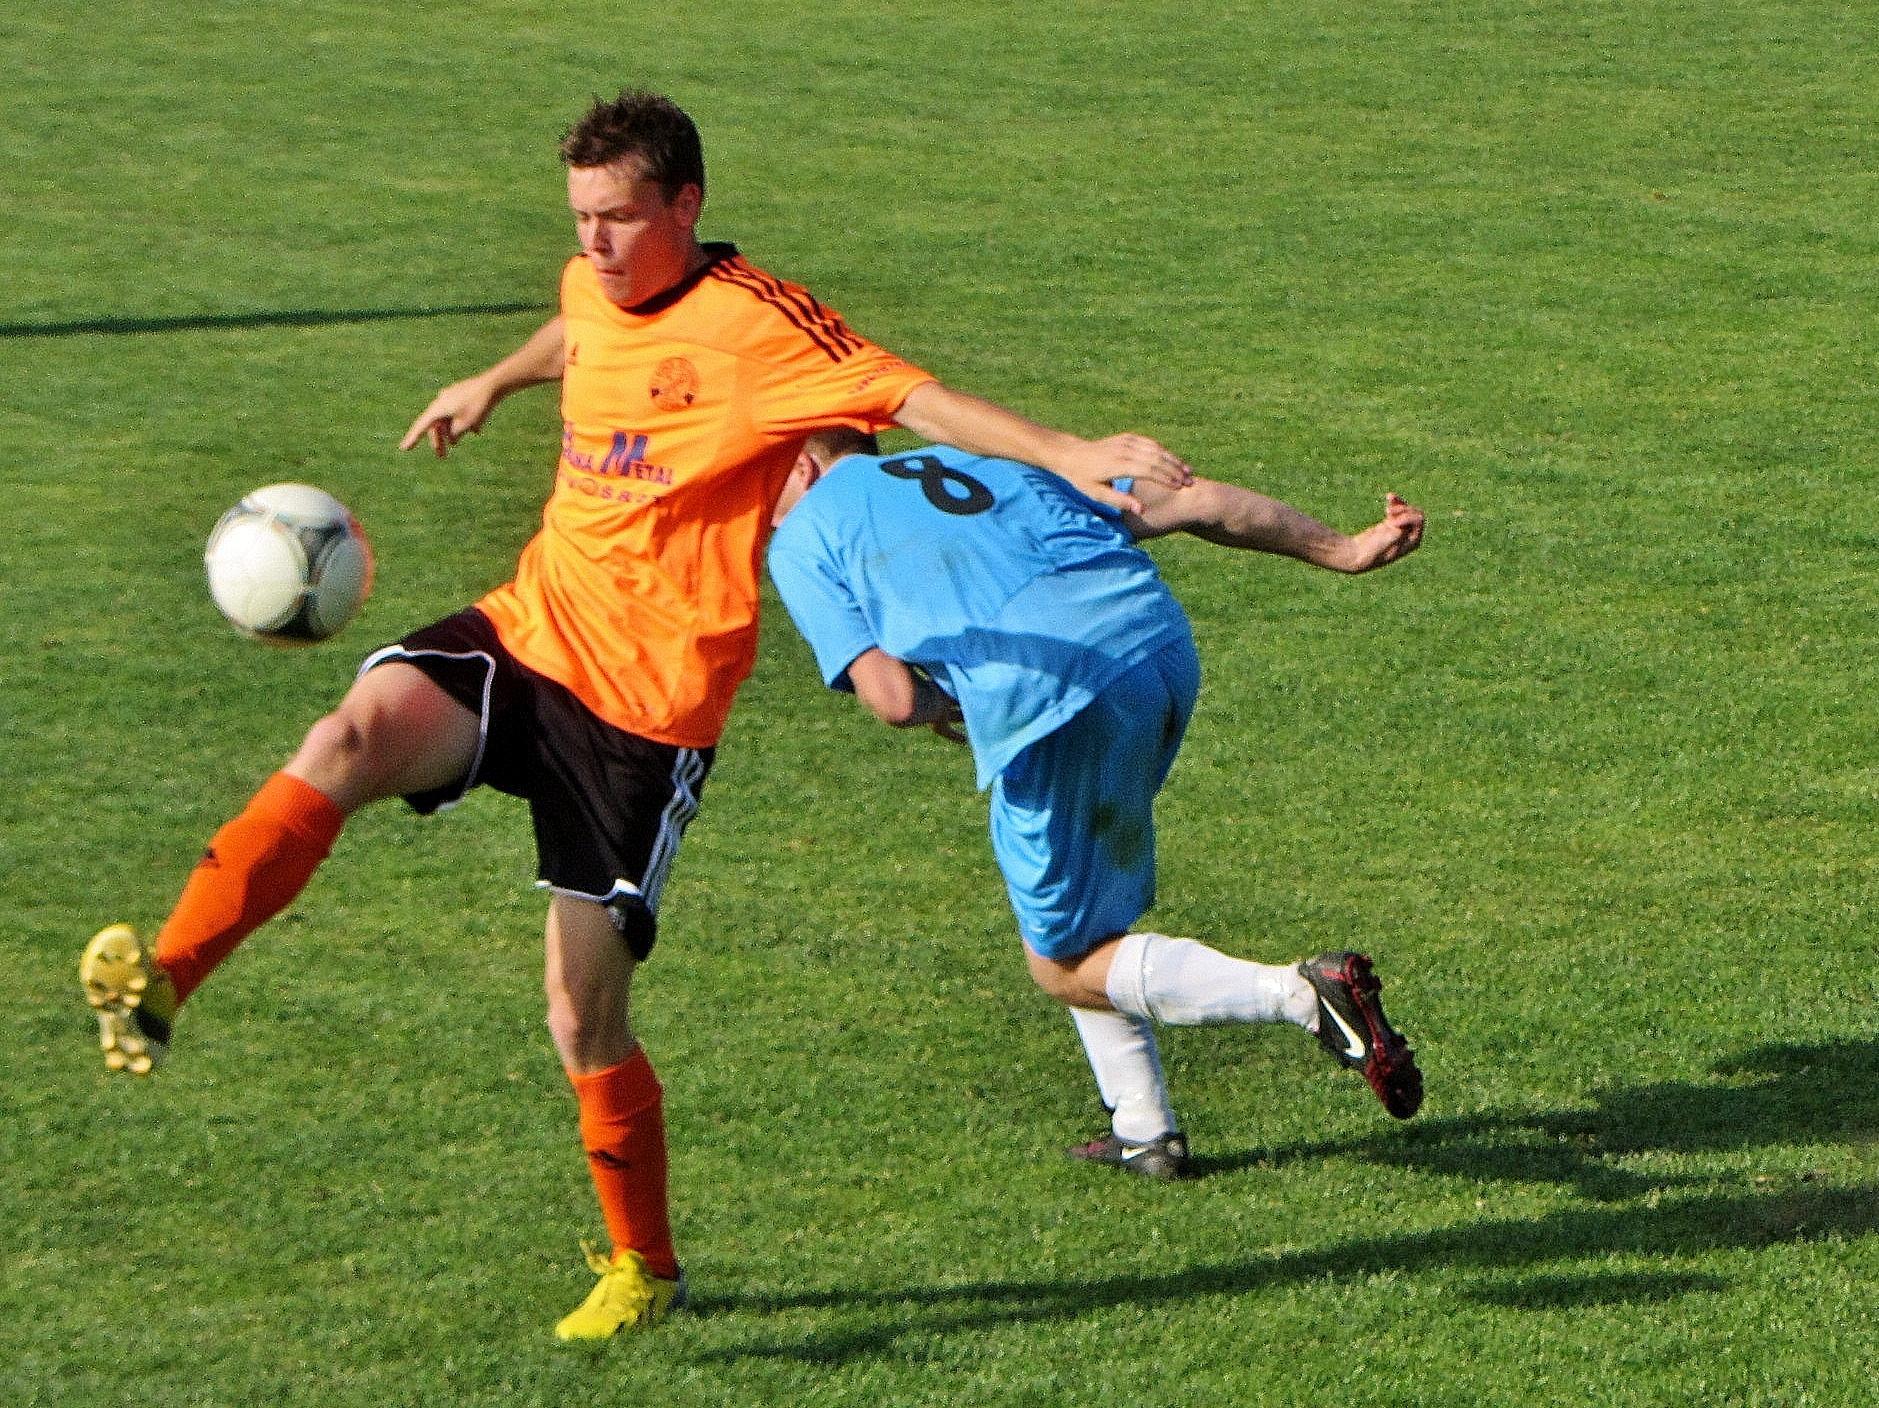 SOKOL ČECHOVICE – FC BEŇOV 3:0 ( 2:0 )